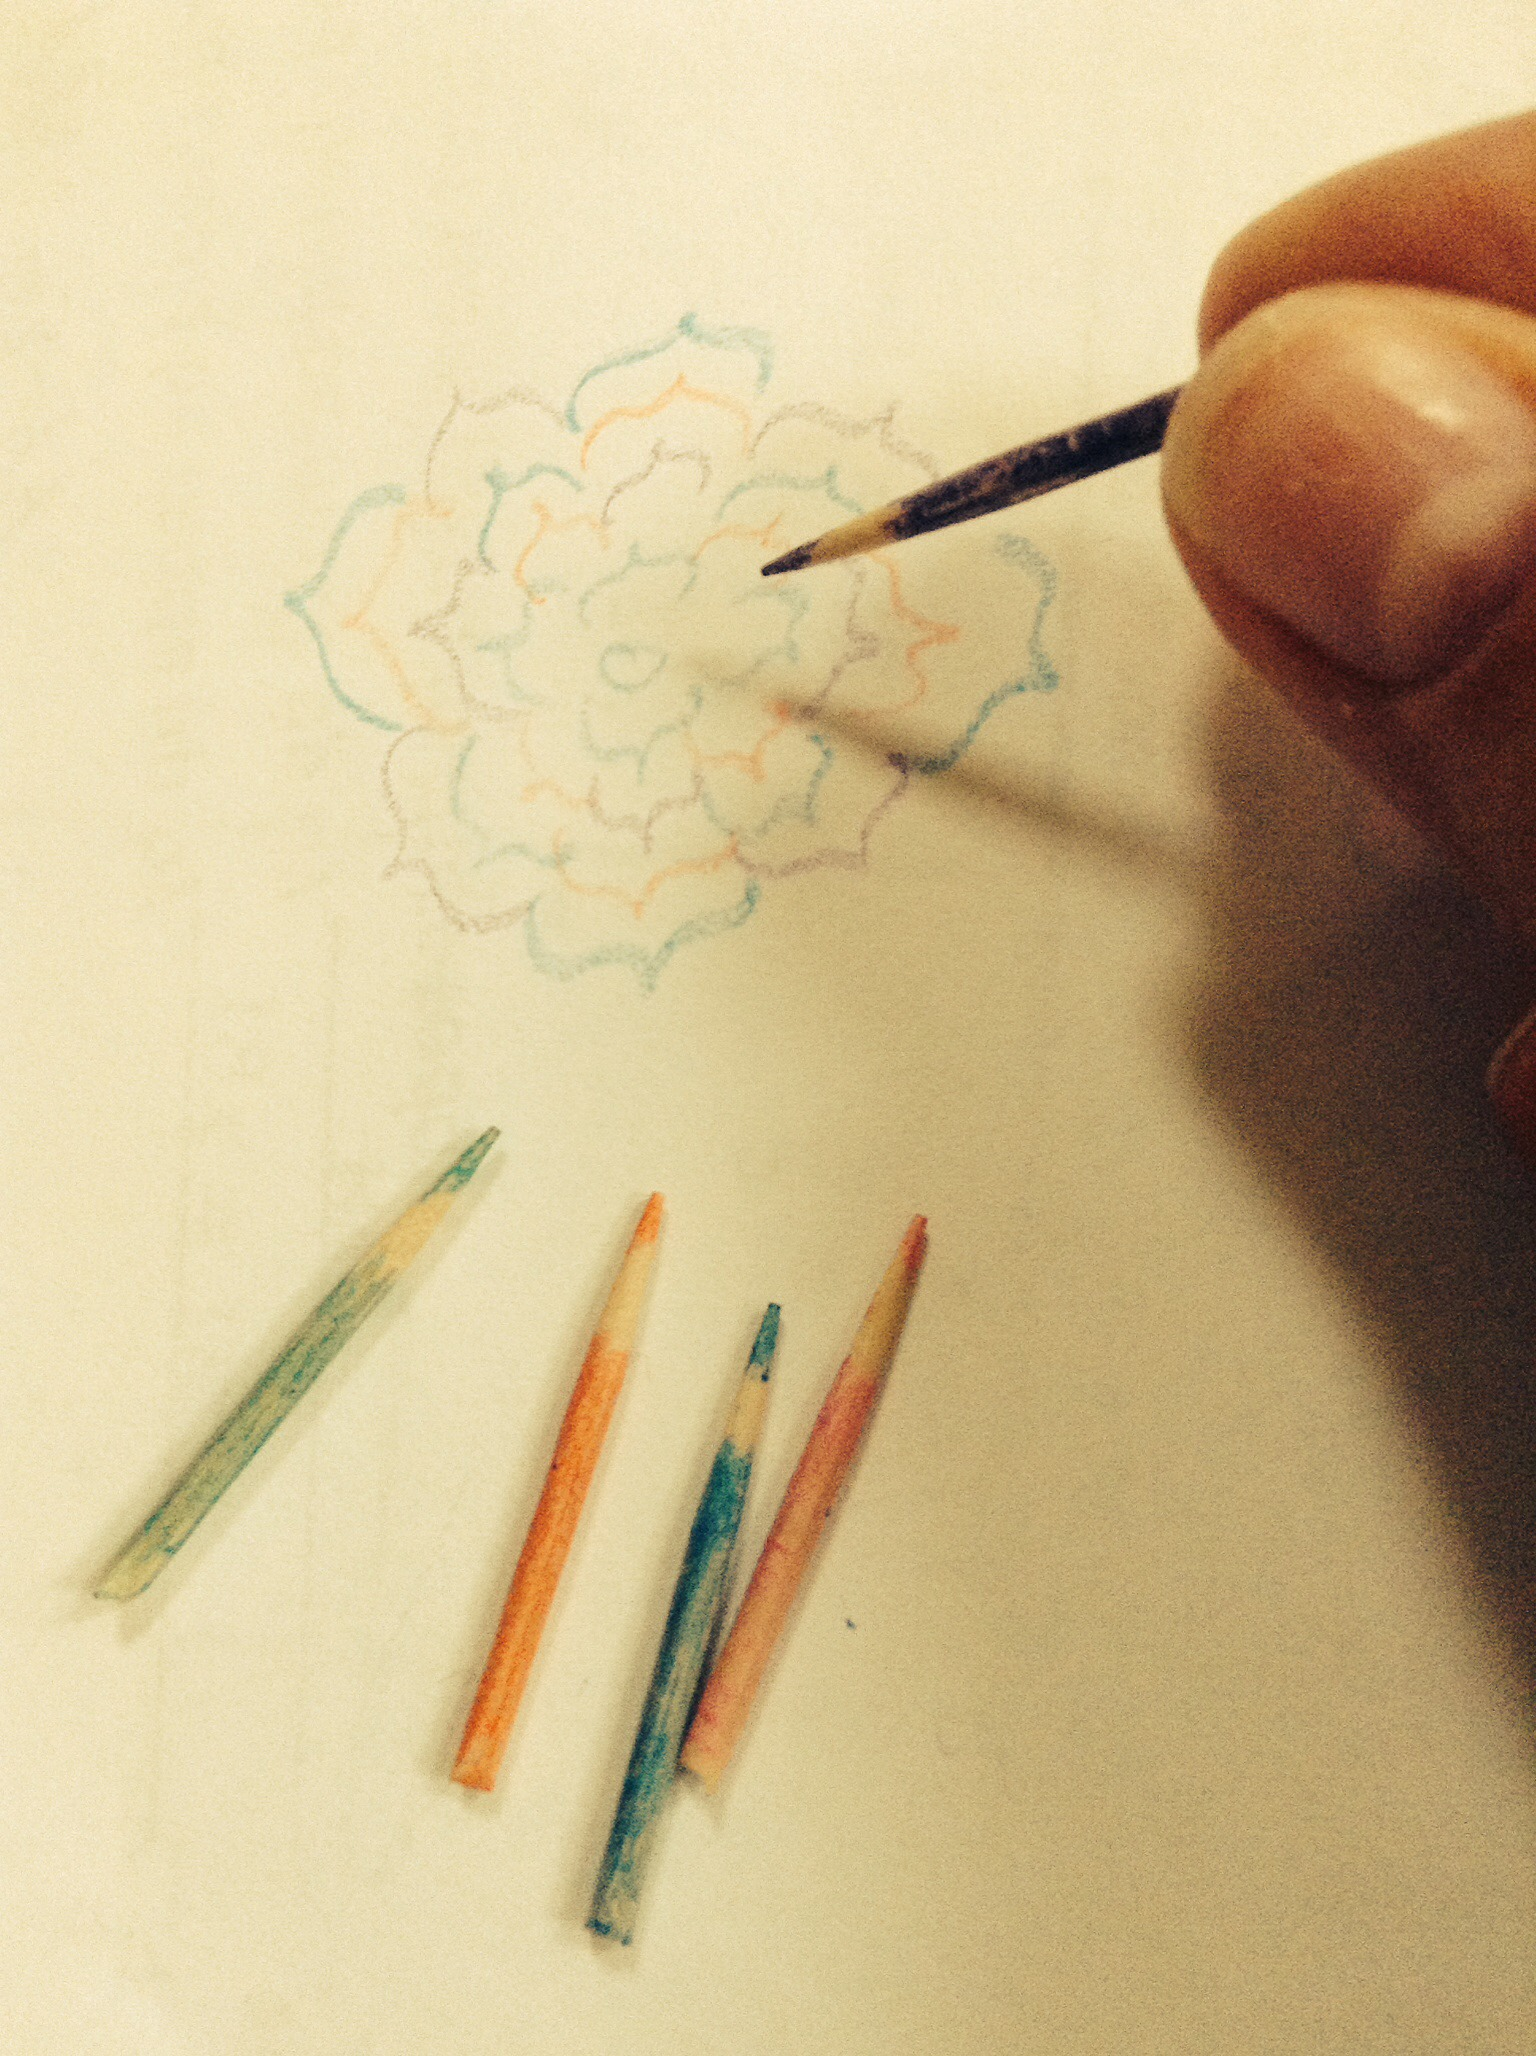 Tiny Colored Pencils